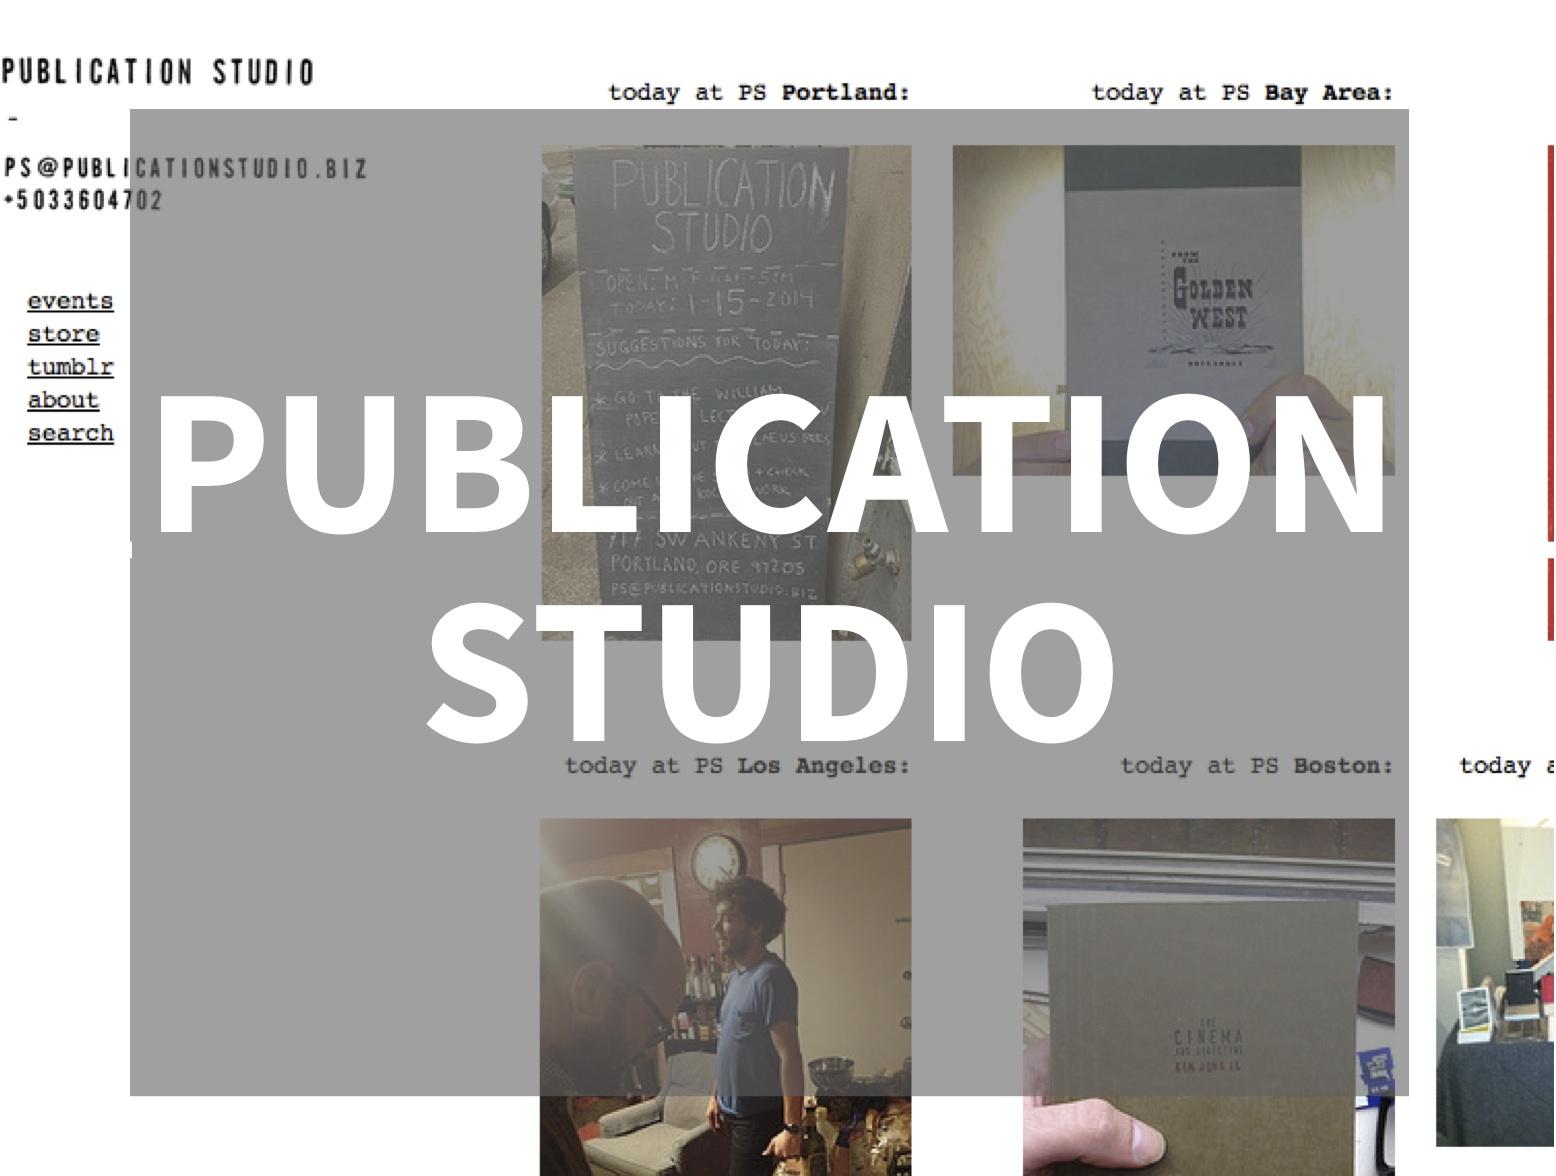 OUBLICATIO STUDIO.jpg